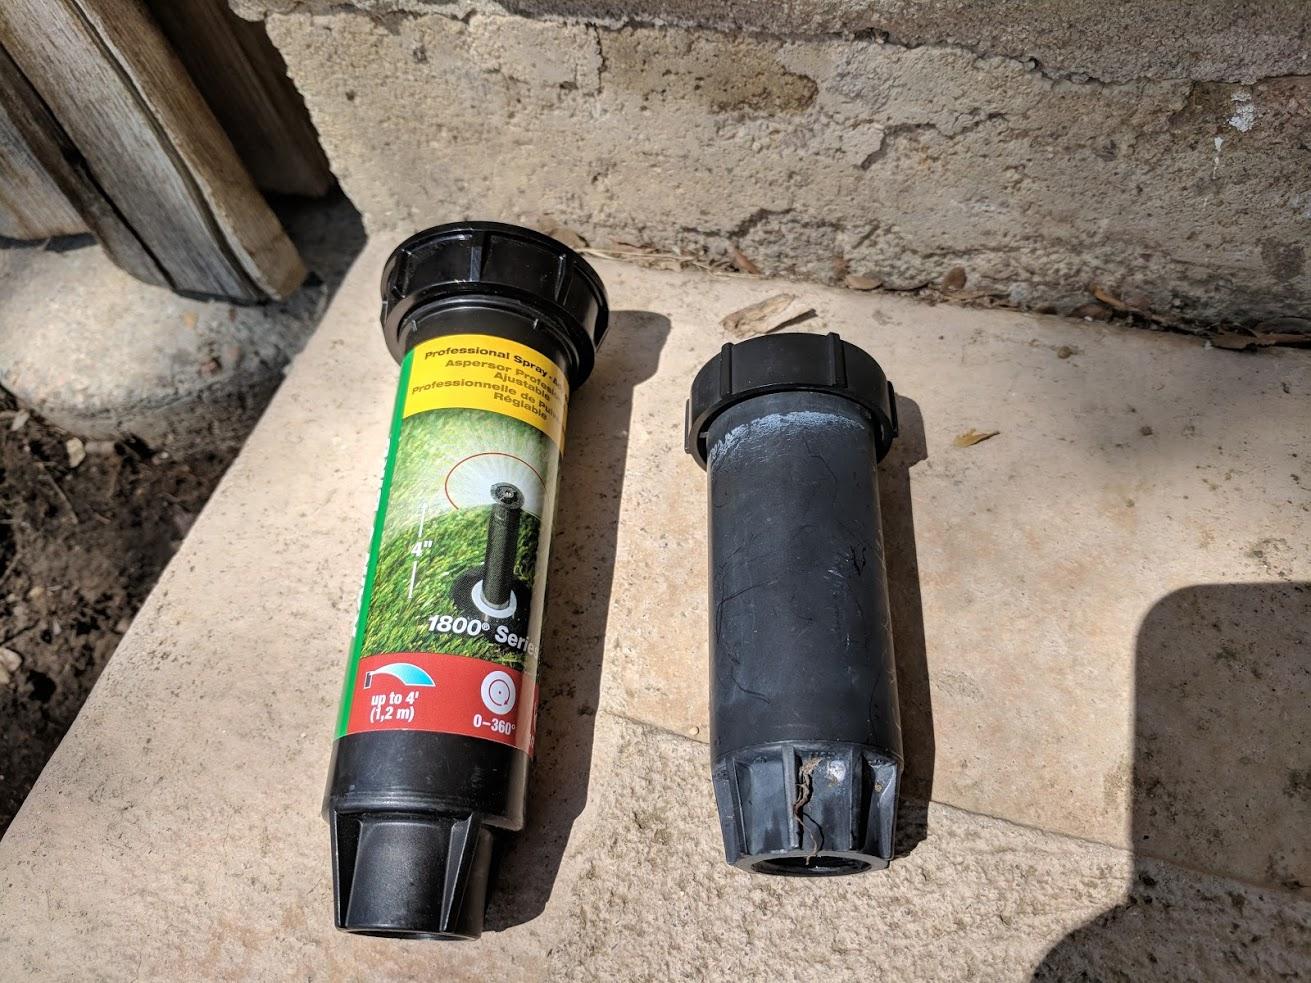 How To Replace A Broken Sprinkler Head - DIY Insiders